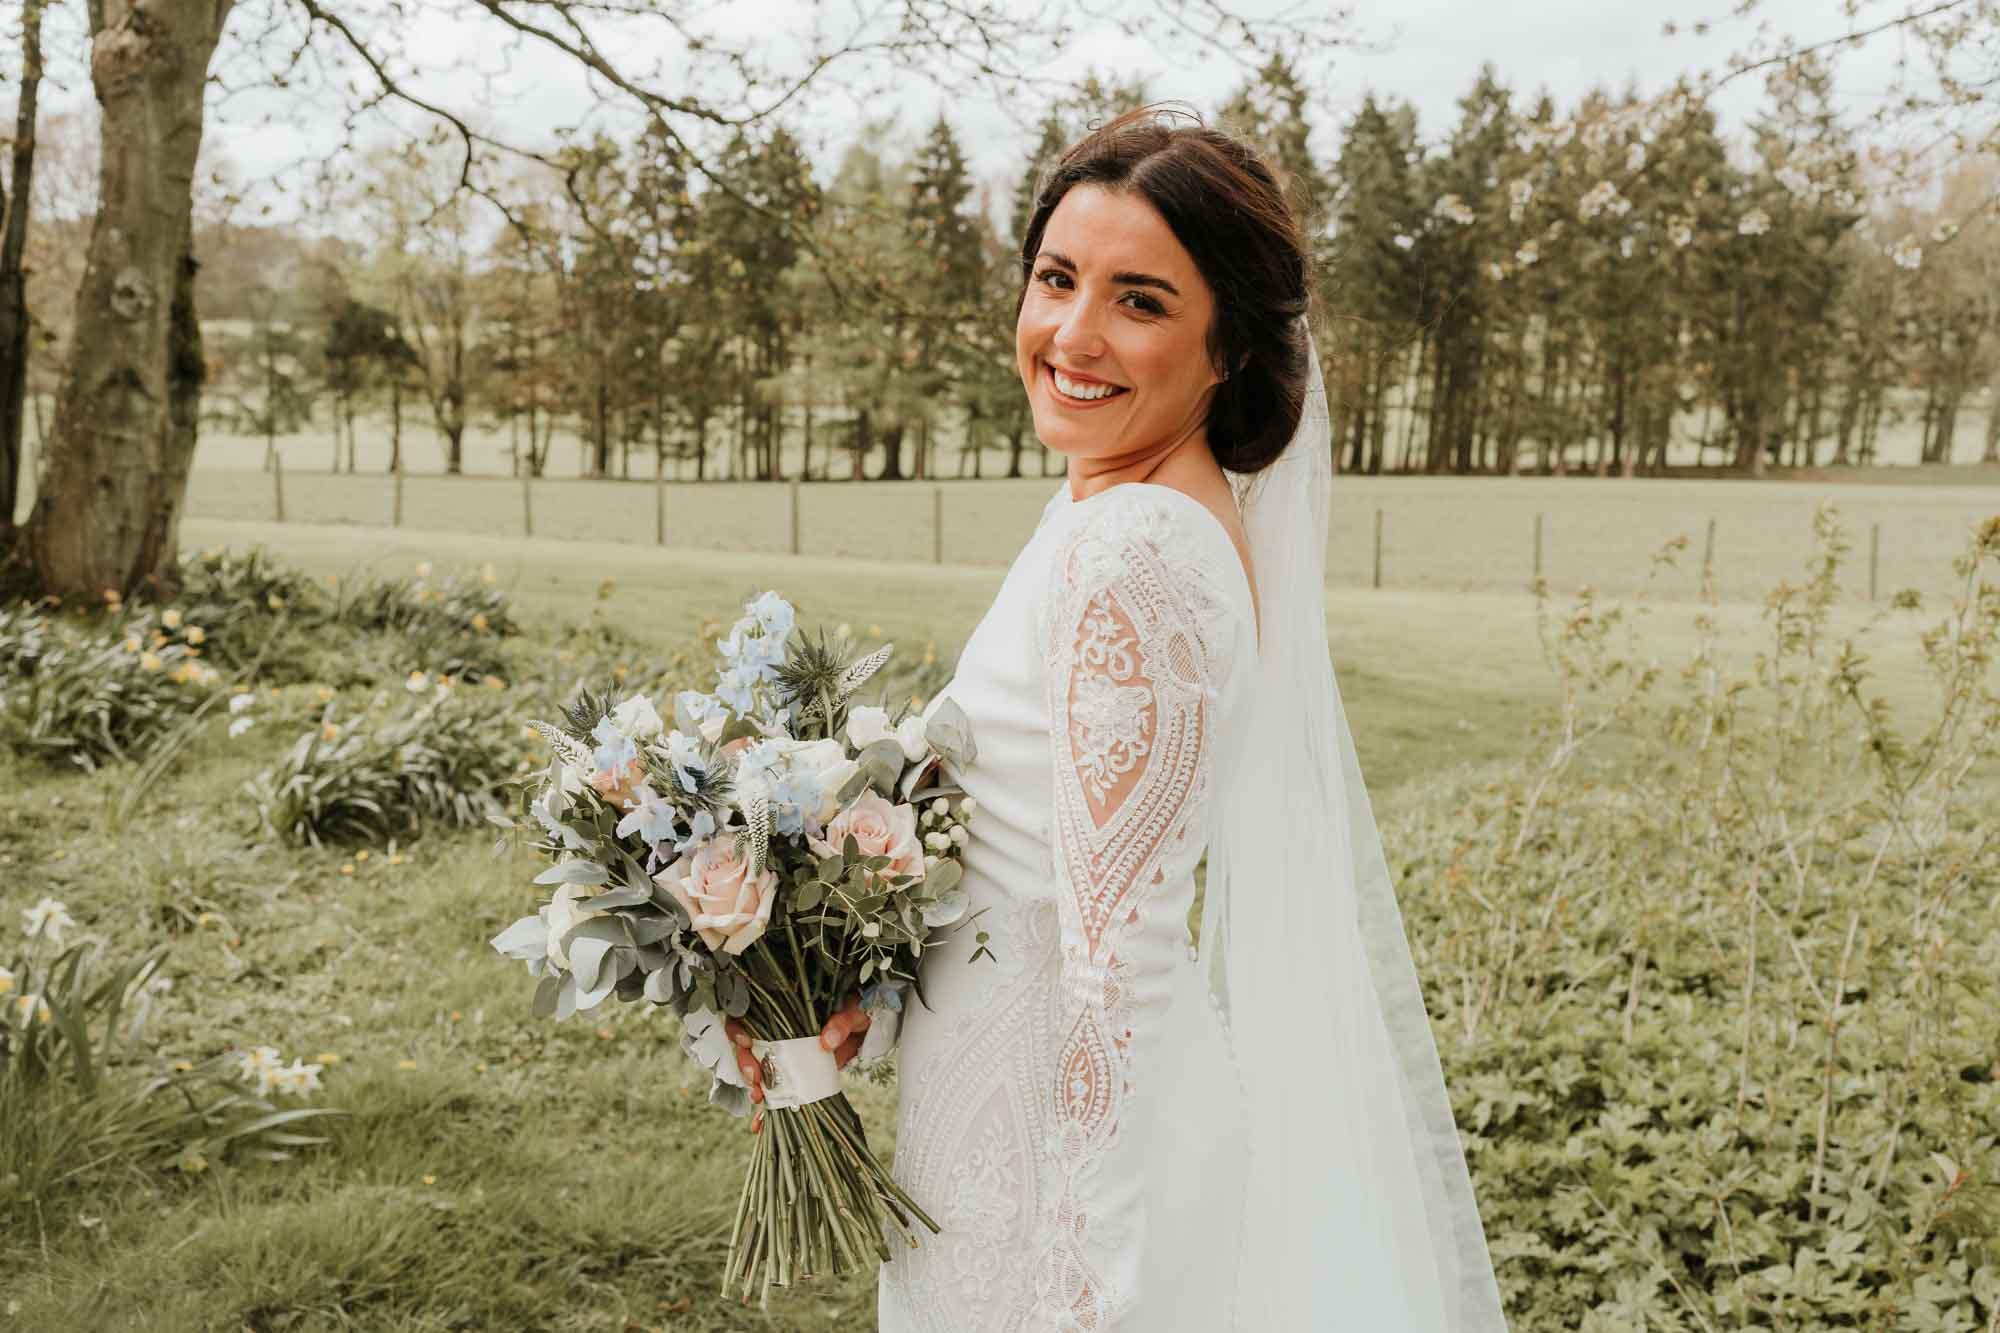 Cornhill Castle Wedding Blog -31